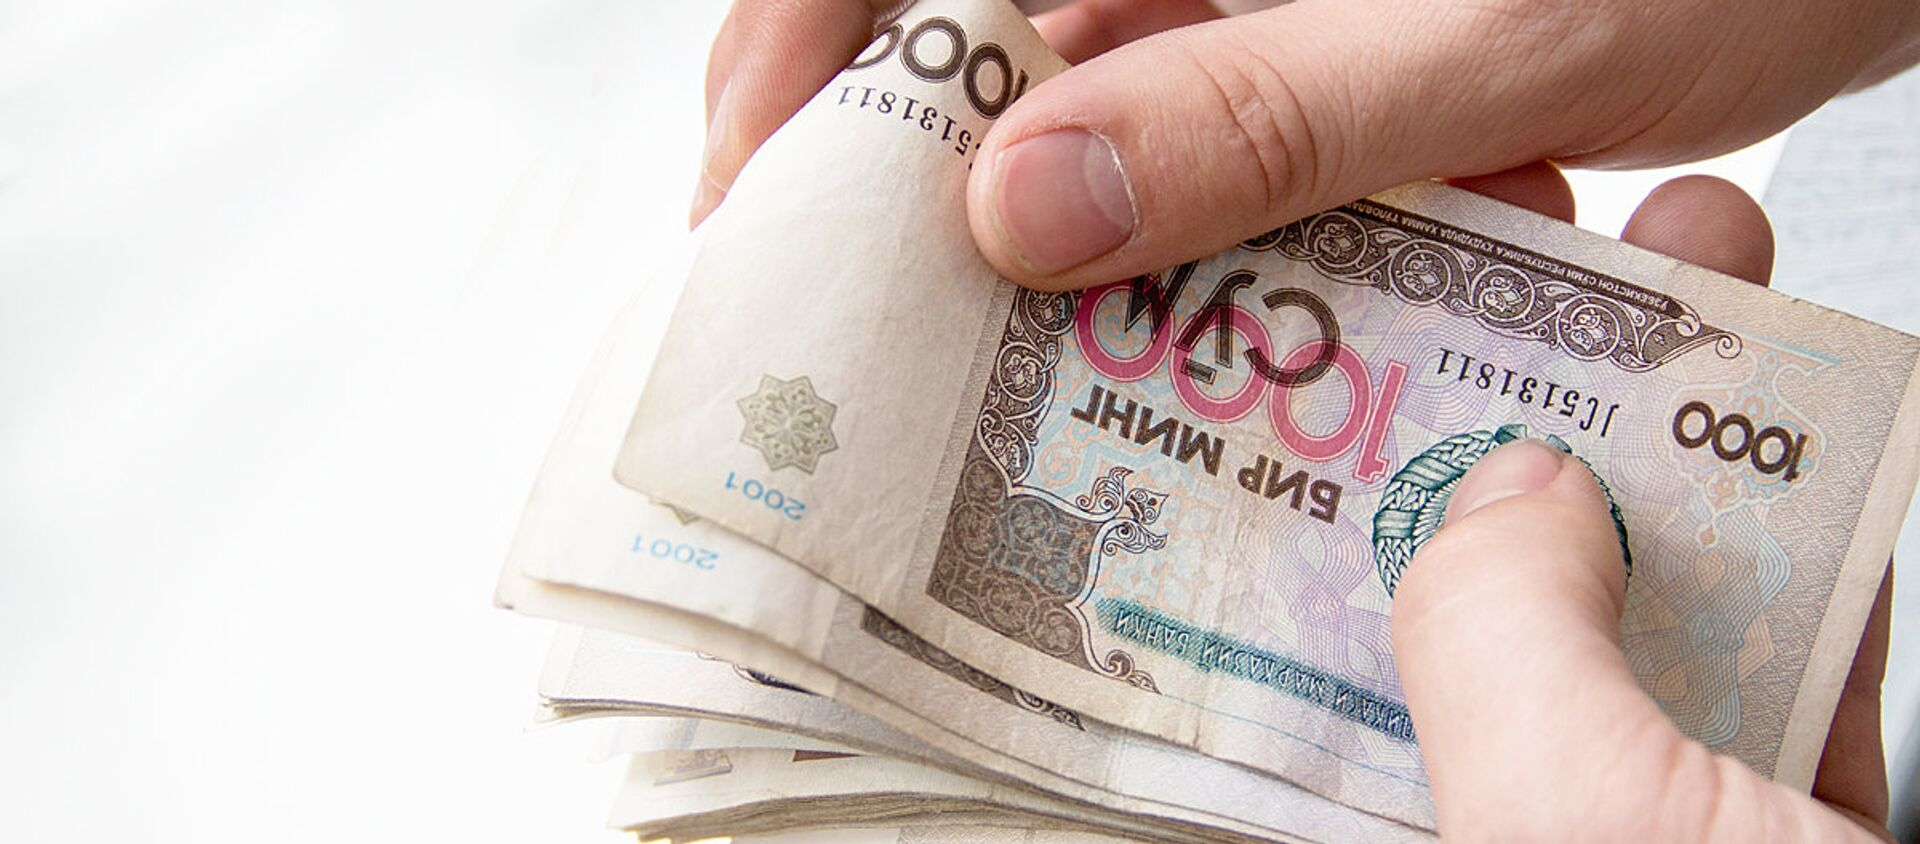 Узбекская валюта - сум - Sputnik Узбекистан, 1920, 24.11.2018